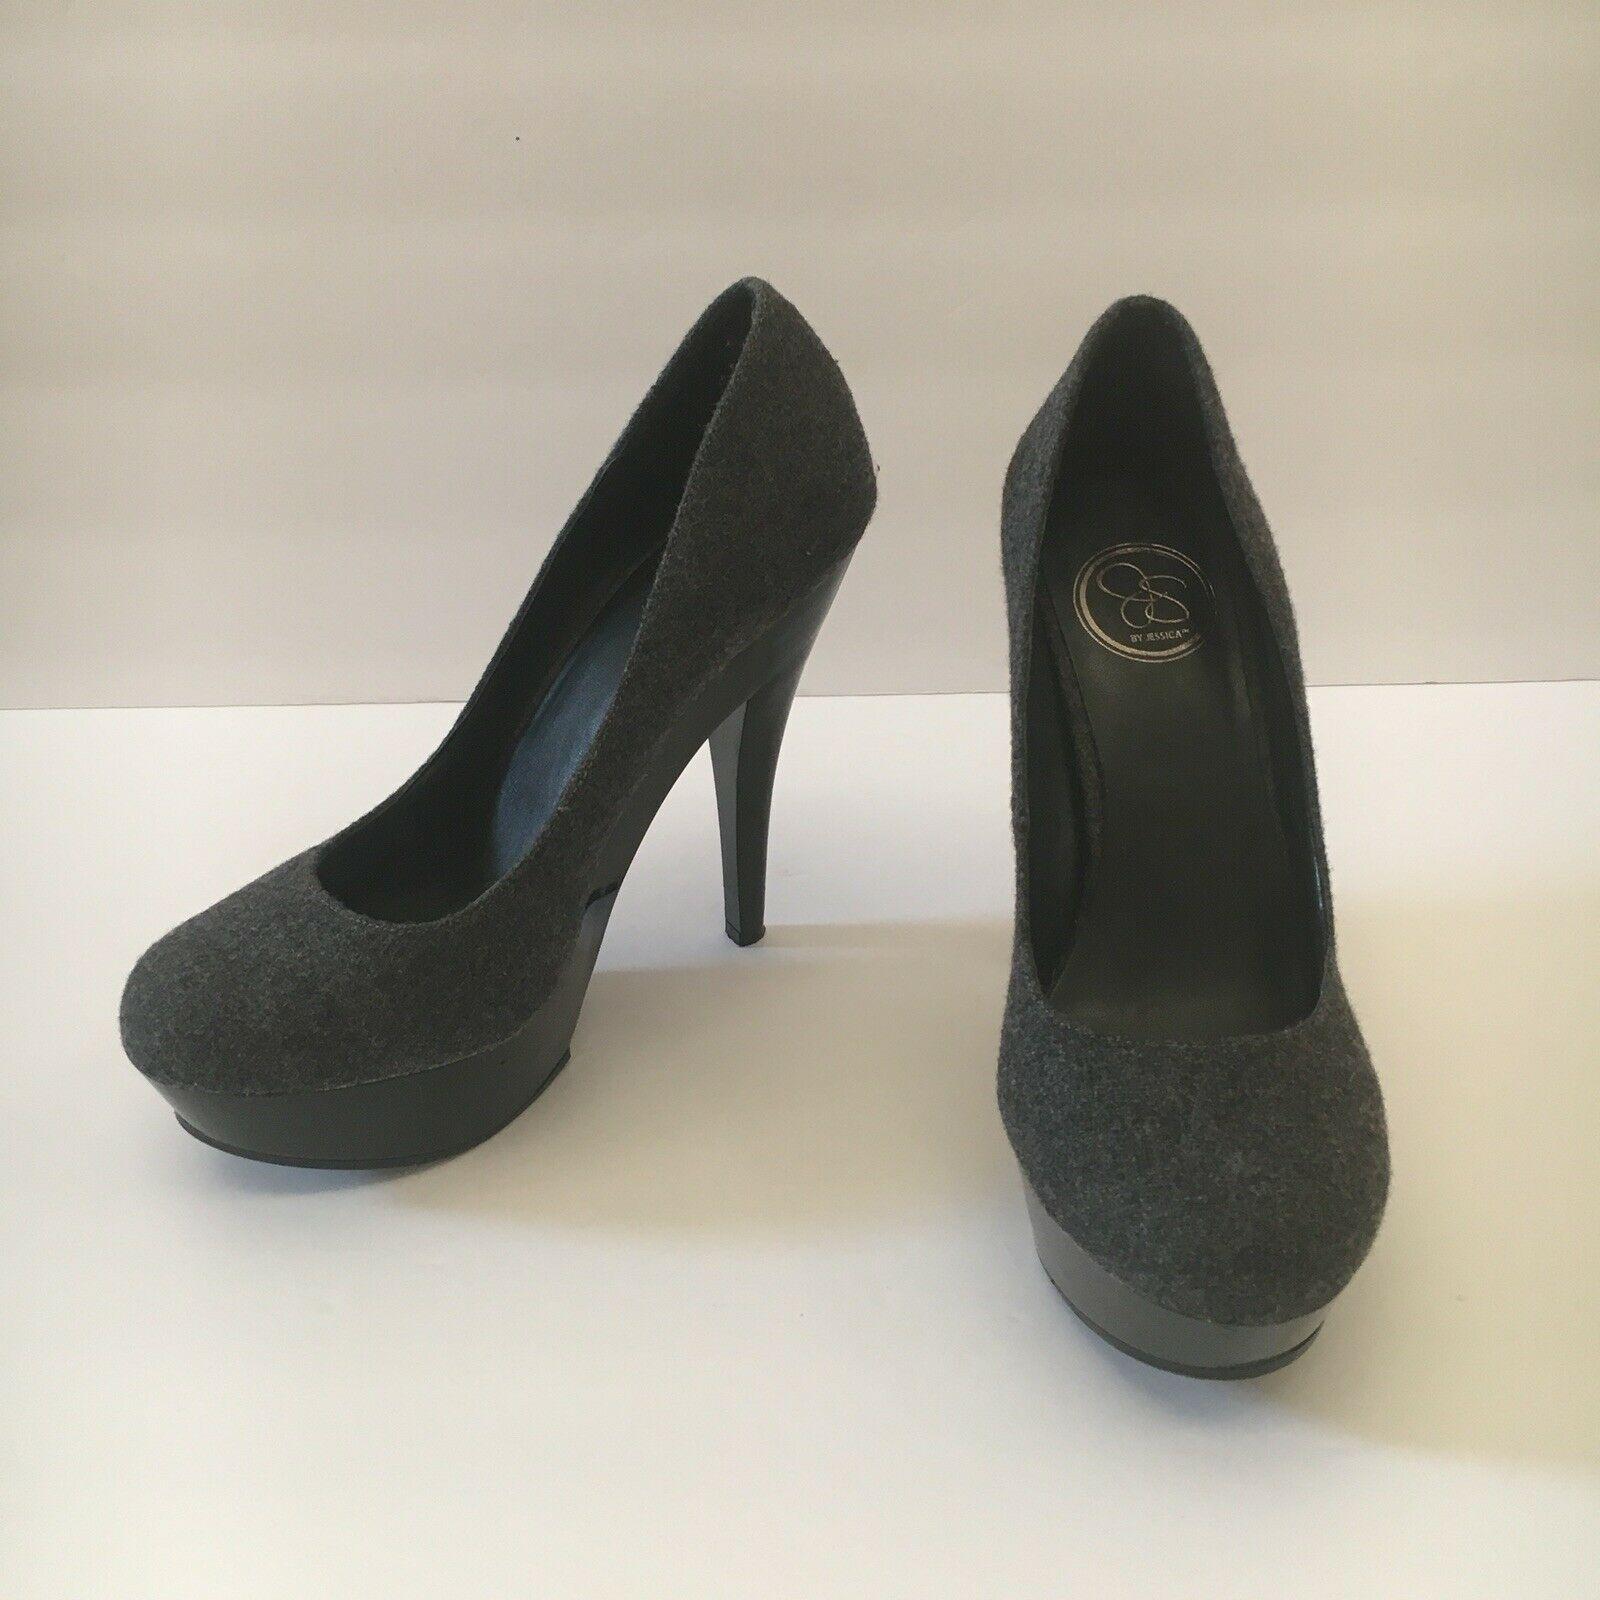 Jessica Simpson Gracex Gray Wool Round Toe Platform Pumps Heels Size 7.5 M